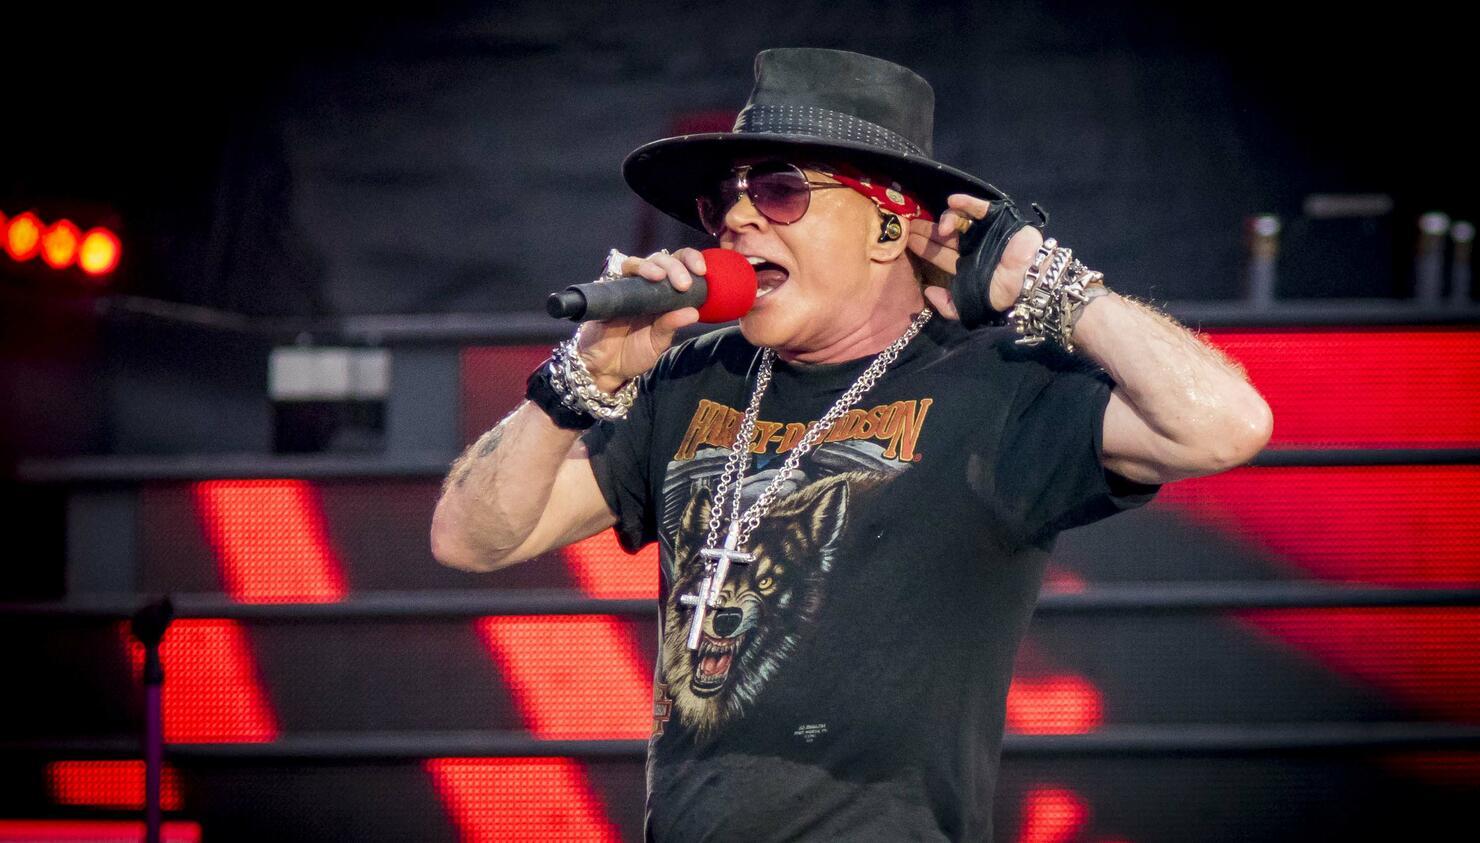 Guns N' Roses Performs At TD Place Stadium